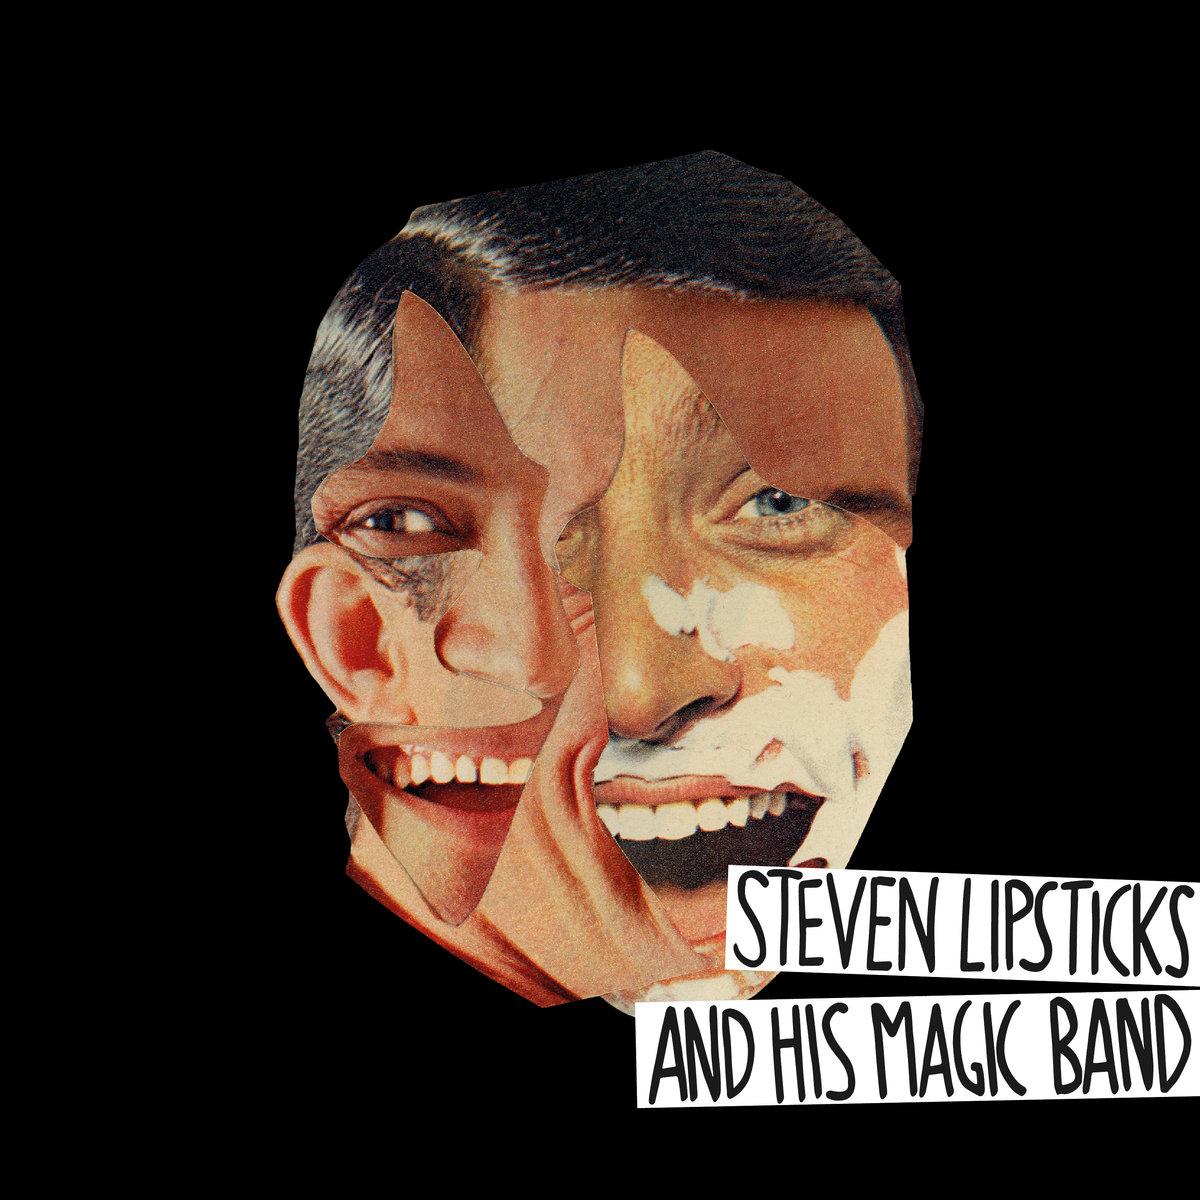 Steven Lipsticks and His Magic Band – Home